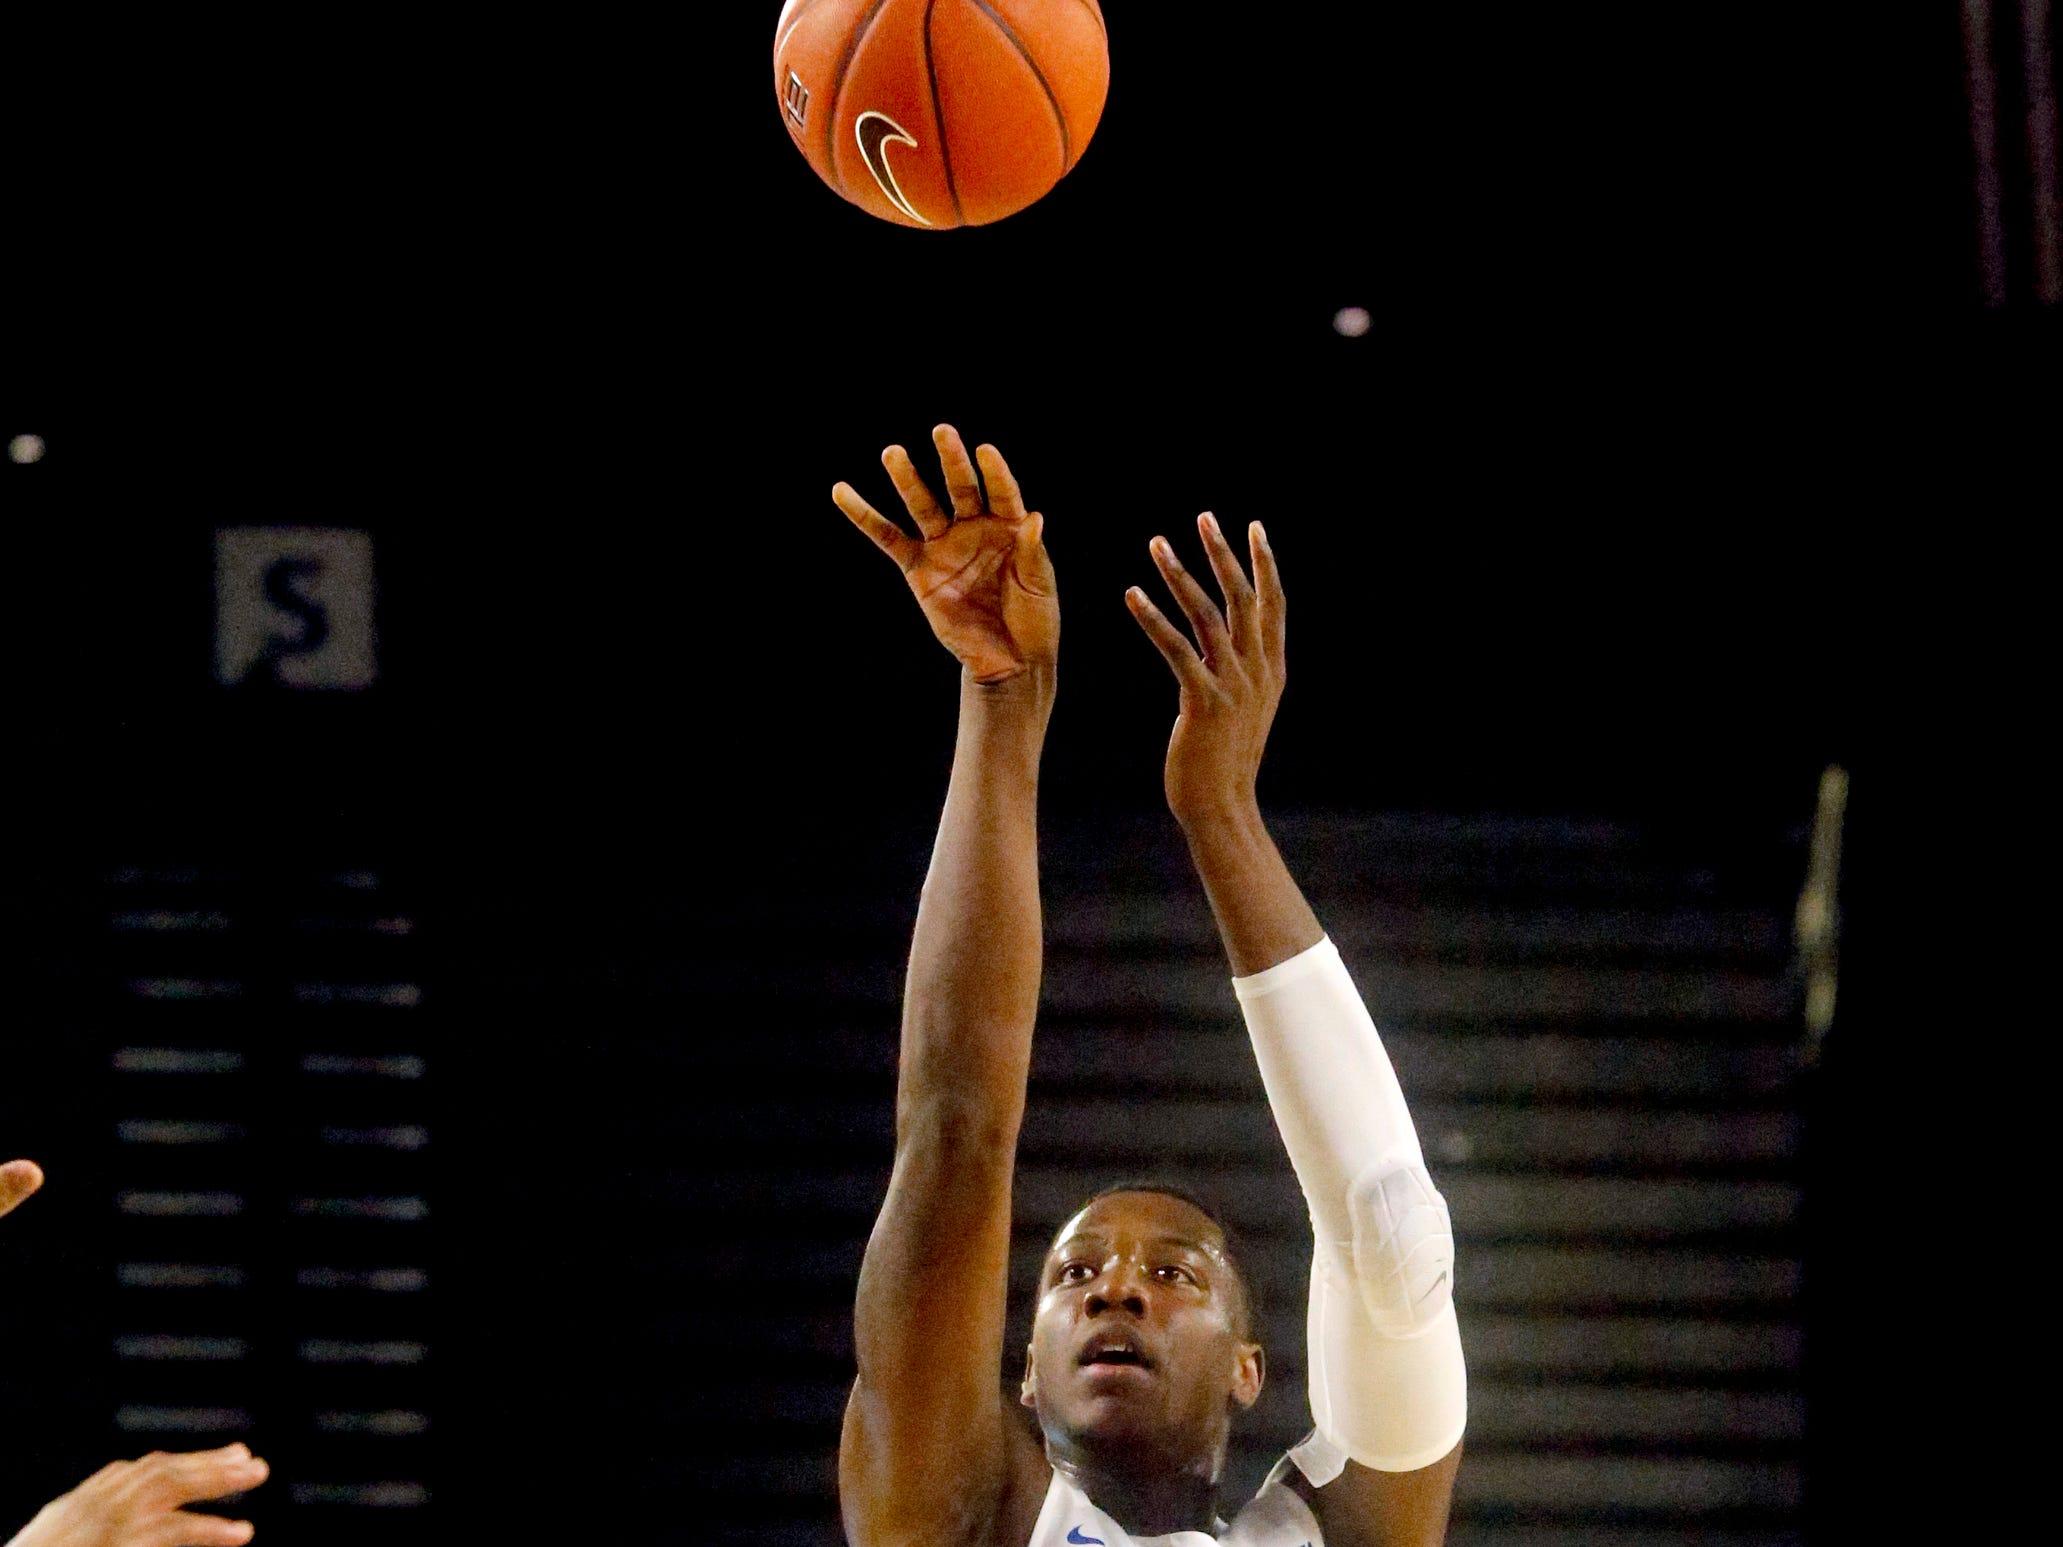 MTSU forward Reggie Scurry (22) shoots a three point basket against UAB on Wednesday Jan. 30, 2019.